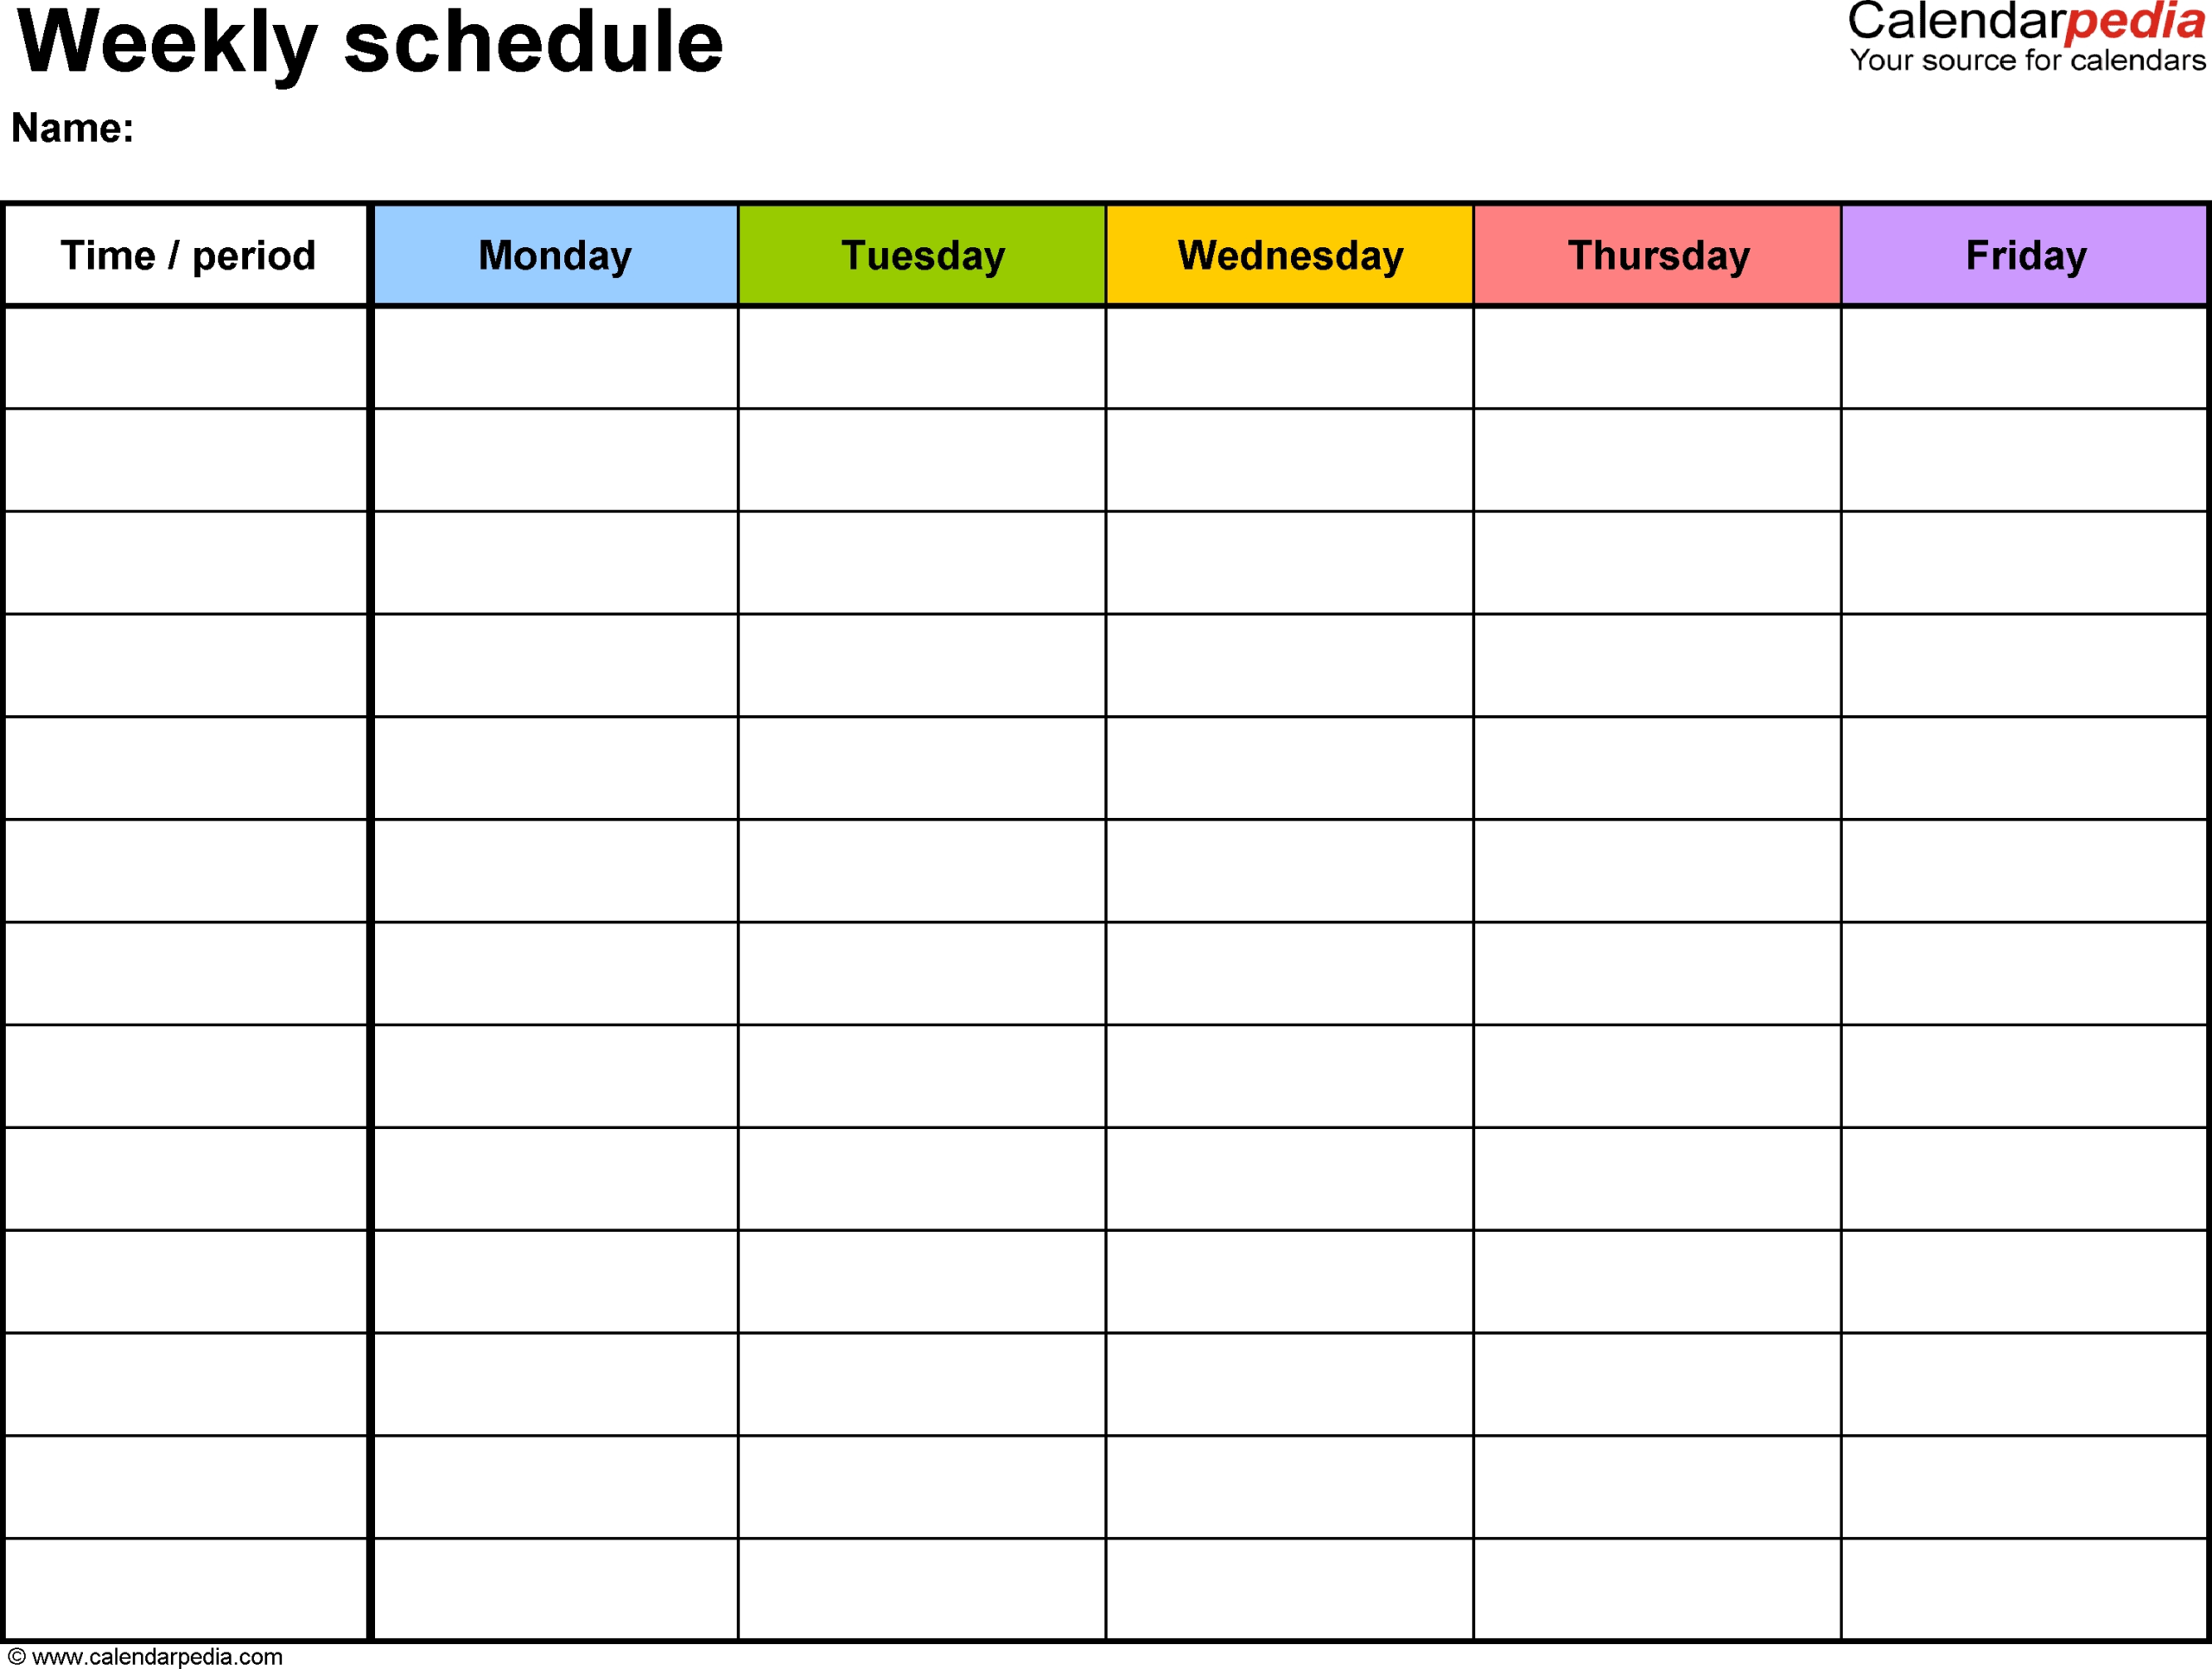 Blank 7 Day Calendar Template  Calendar Inspiration Design intended for 7 Day Calendar Template